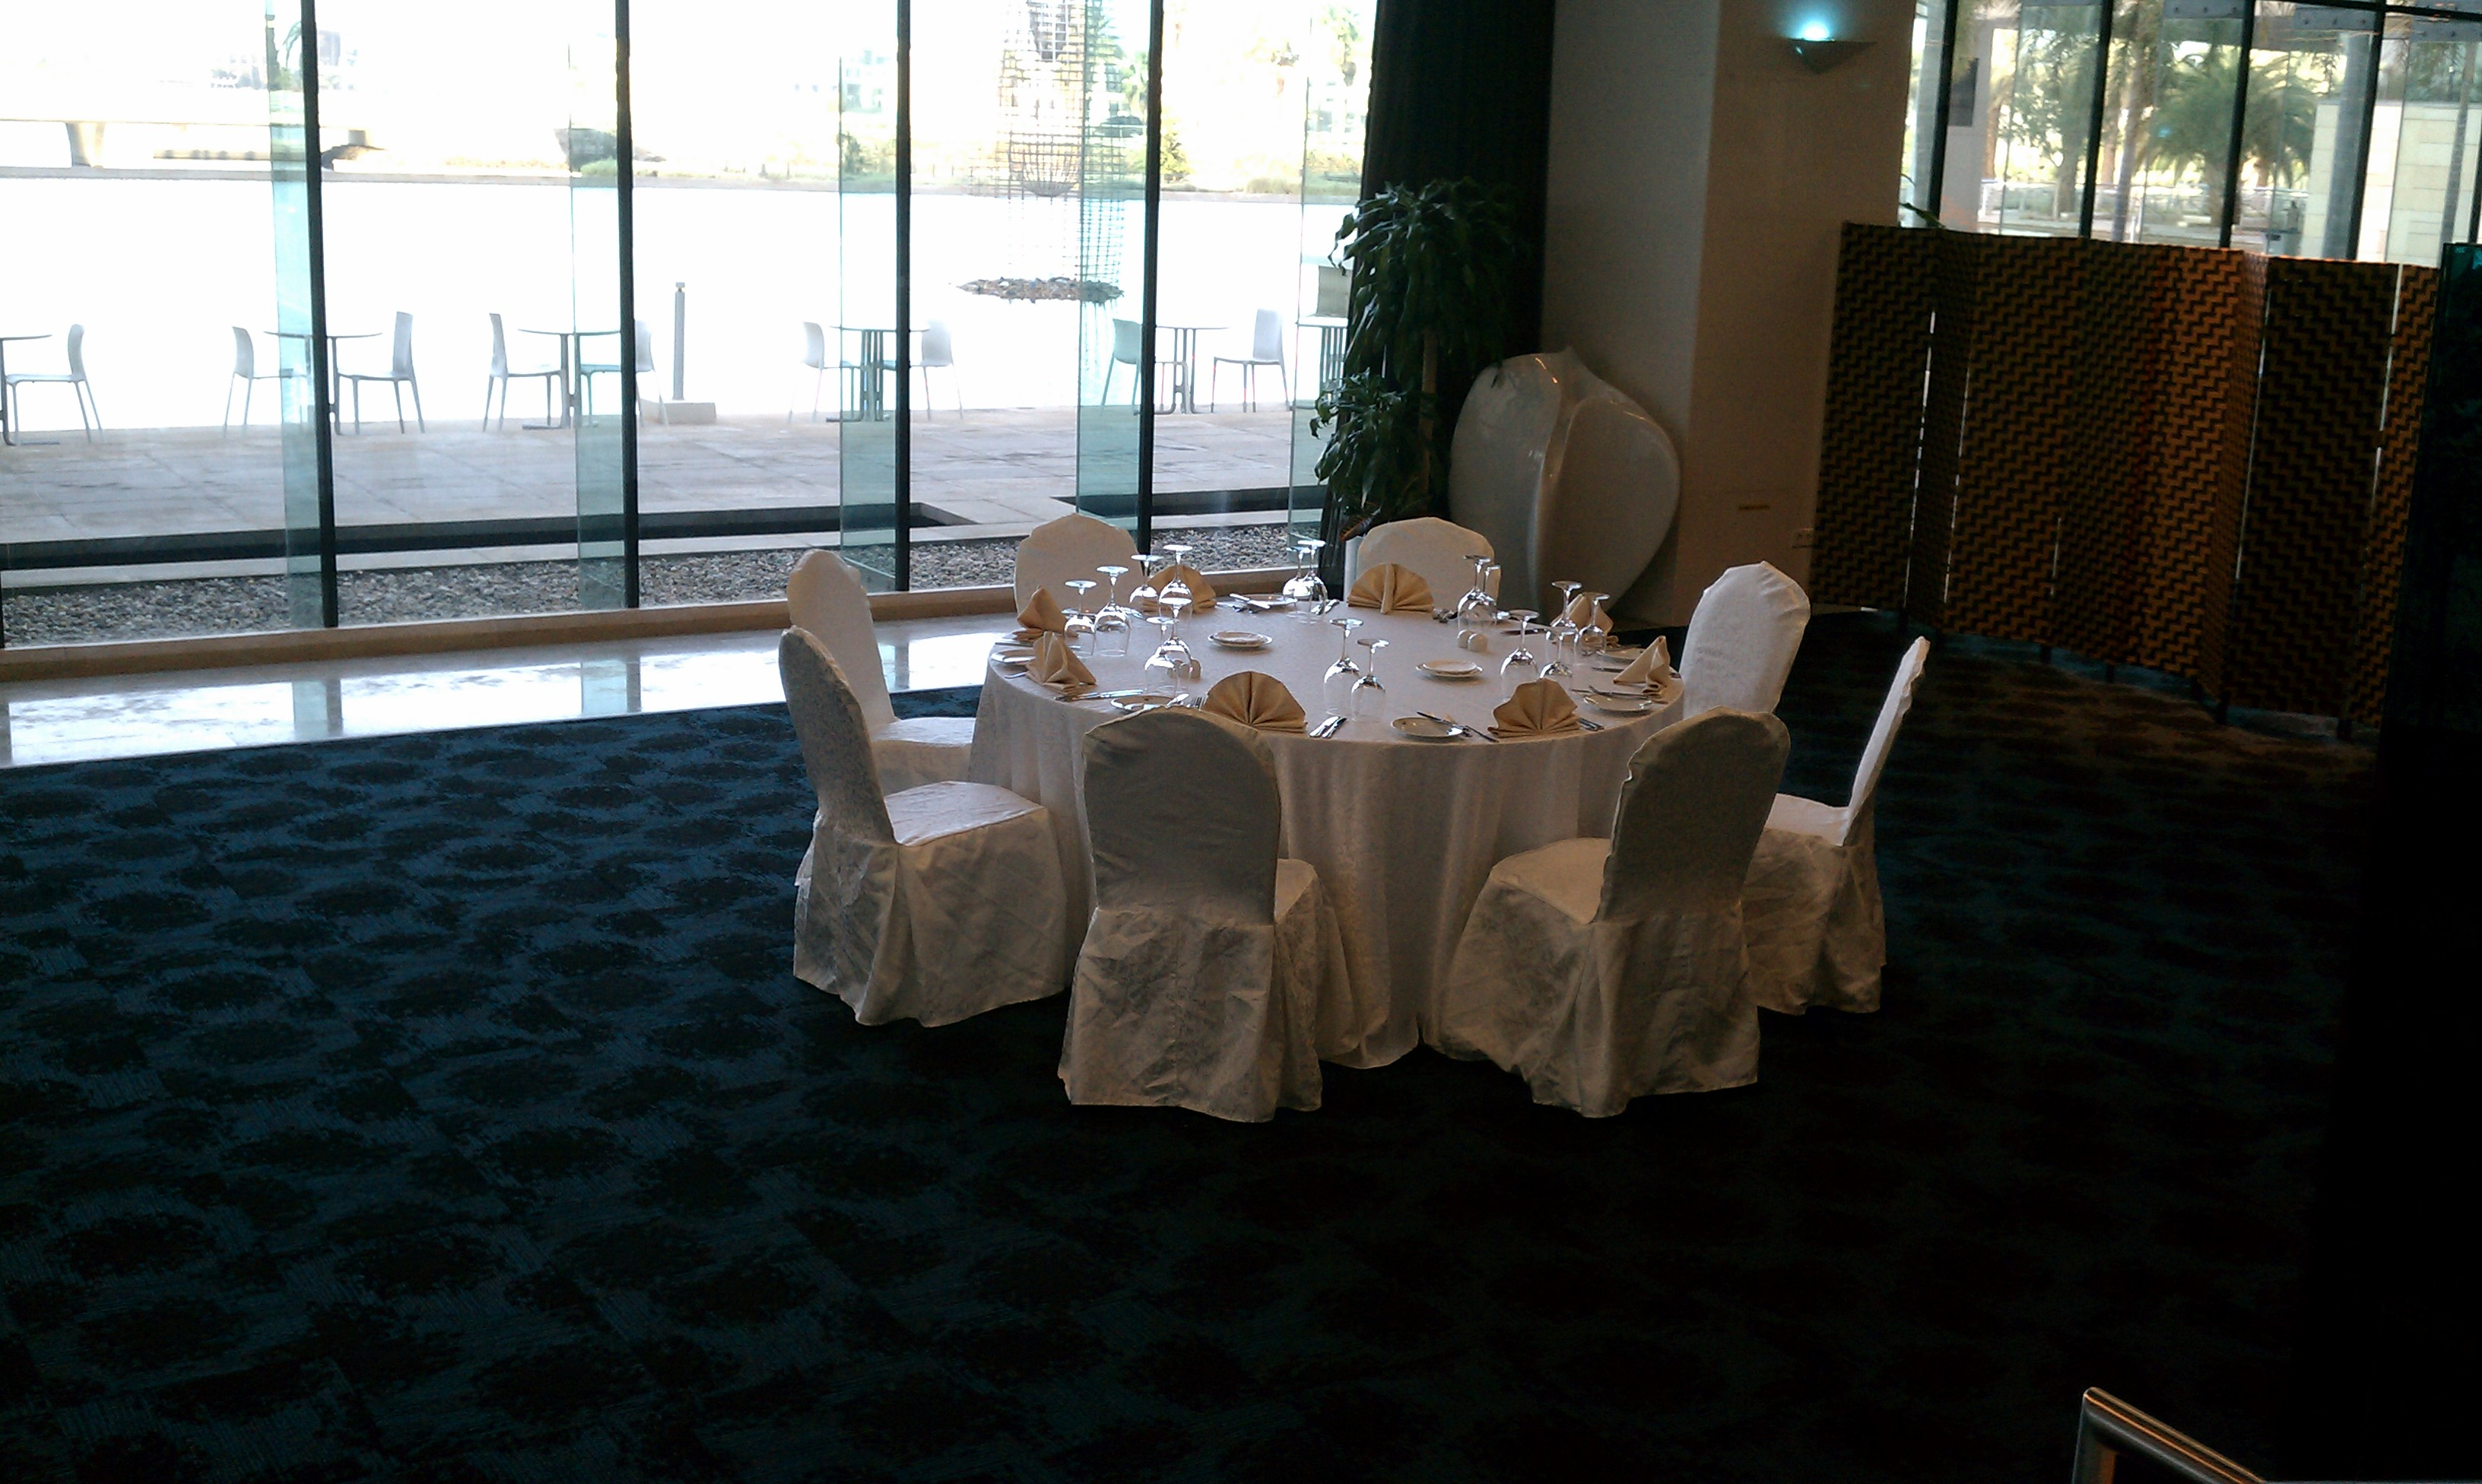 FileSaudi Arabia fine dining table setting.jpg & File:Saudi Arabia fine dining table setting.jpg - Wikimedia Commons